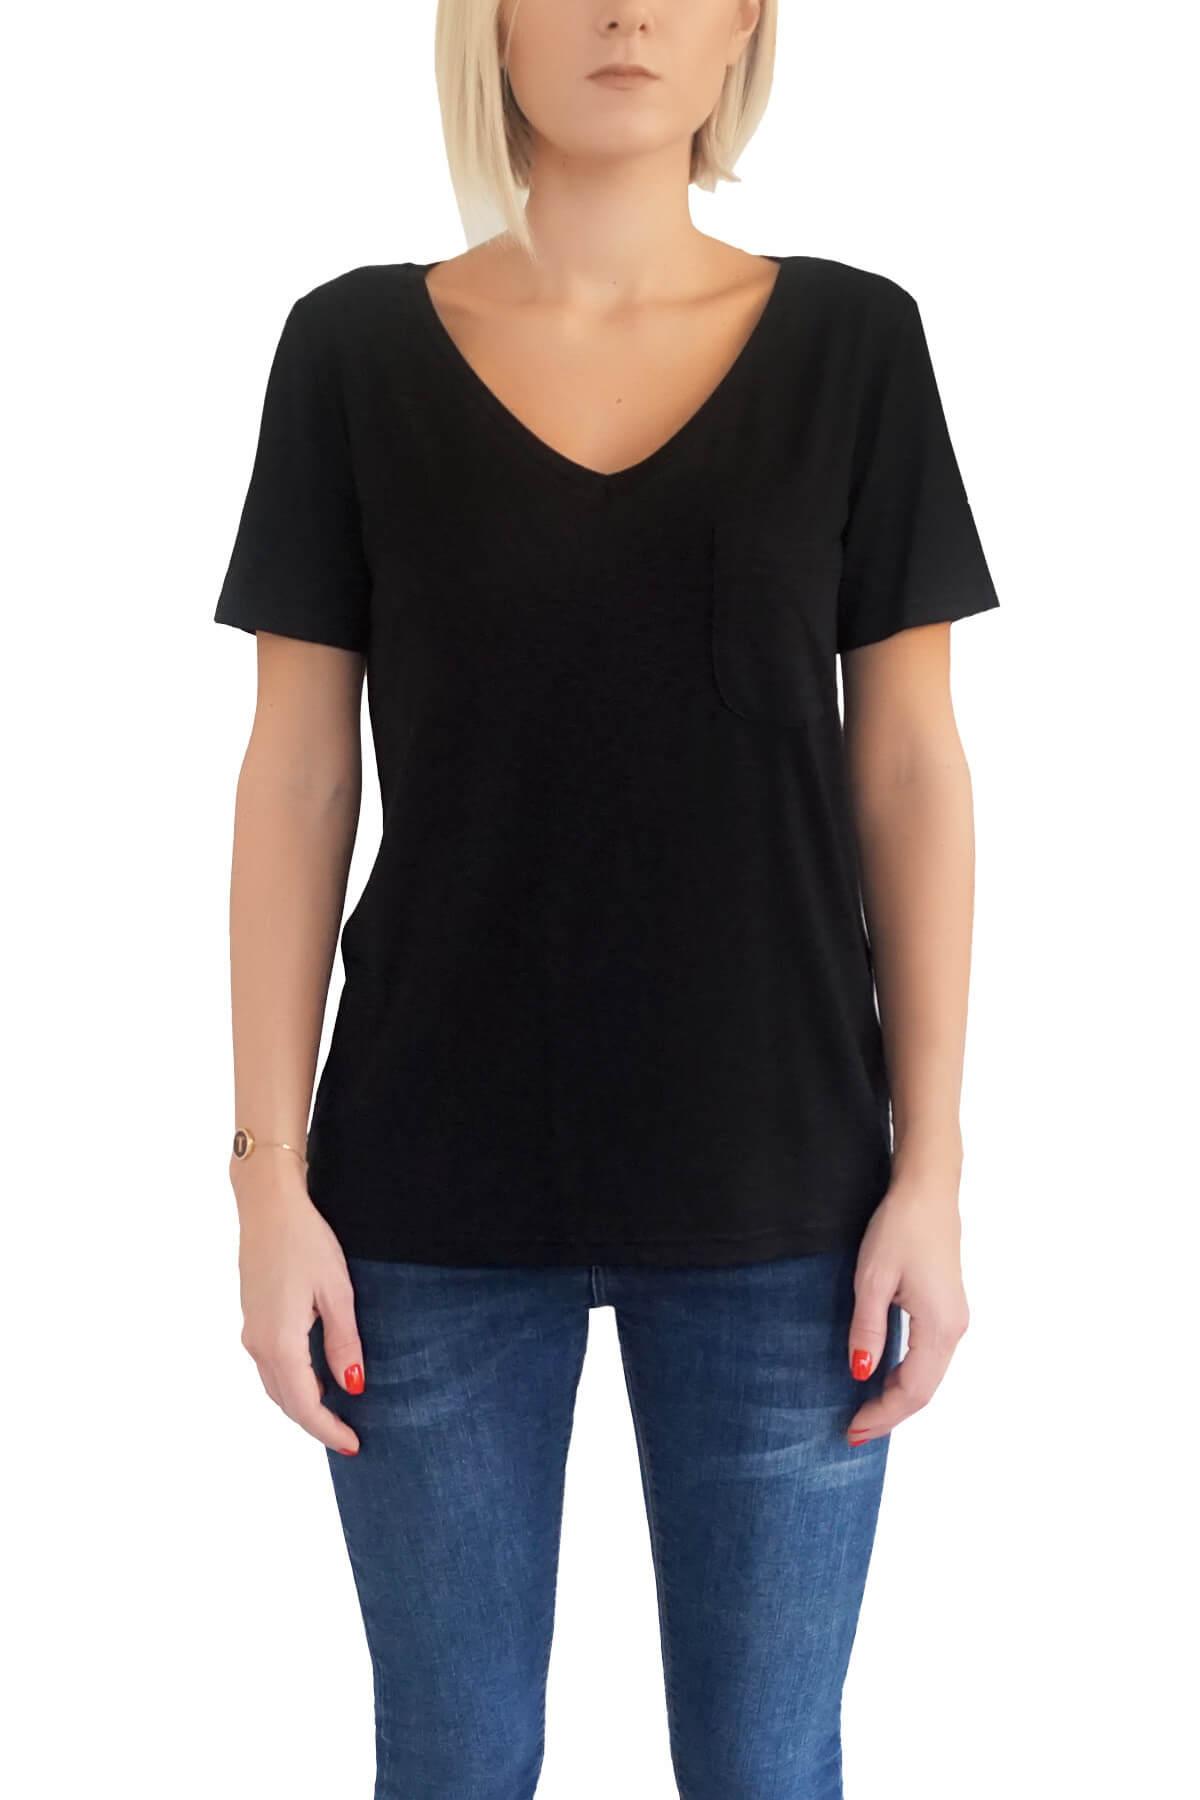 MOF Kadın Siyah T-Shirt VYCT-S 1